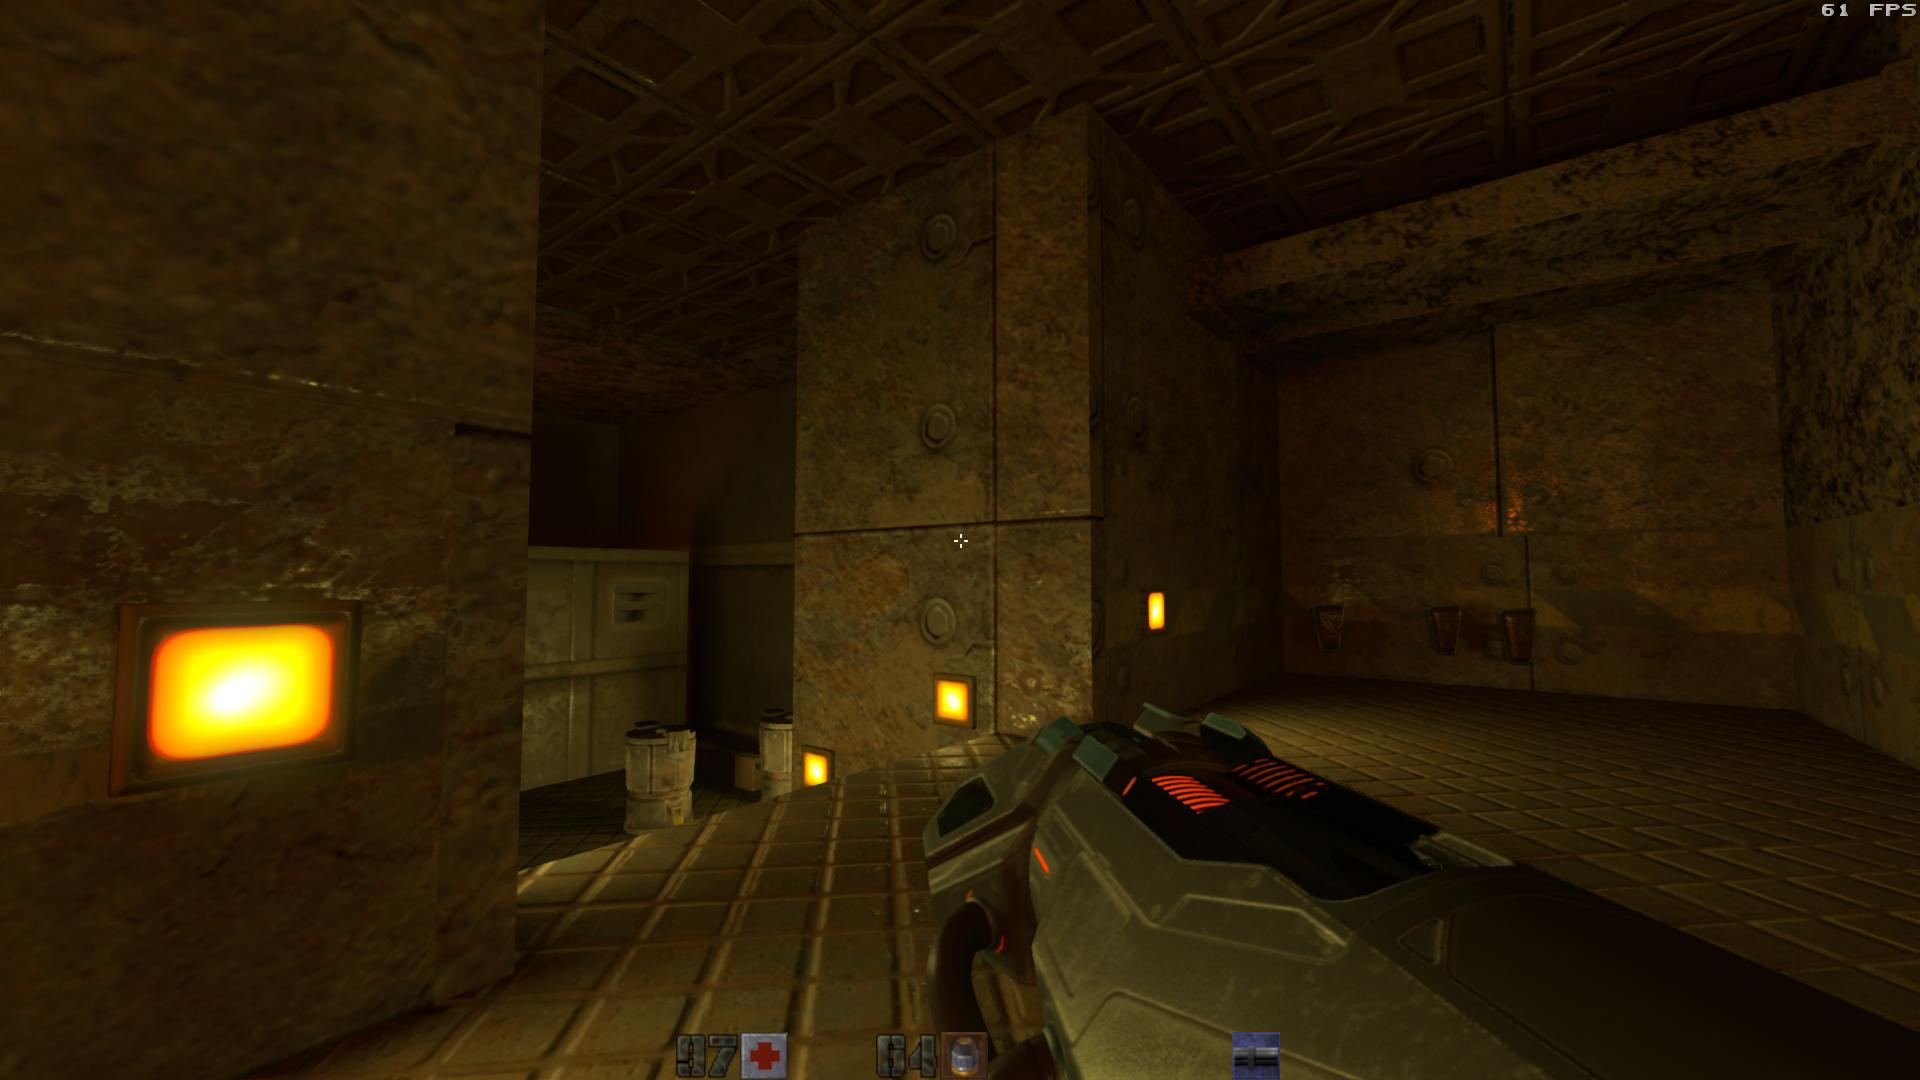 Quake 2 RTX Remaster Screenshot 2019.09.12 - 21.22.21.15.png